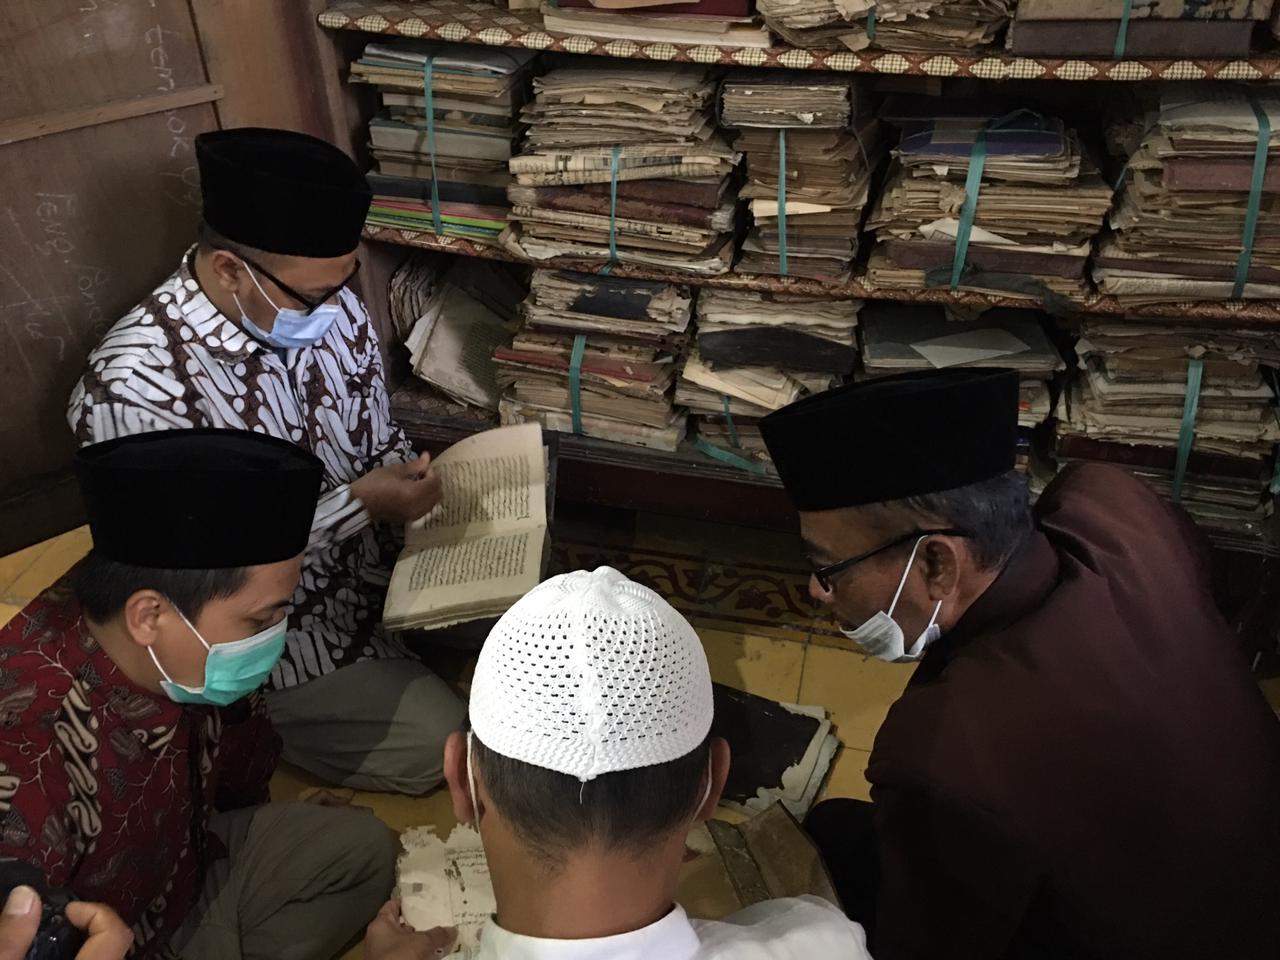 Mengisi Ramadhan, Lestarikan Manuskrip Keislaman di Pesantren Jawa Timur